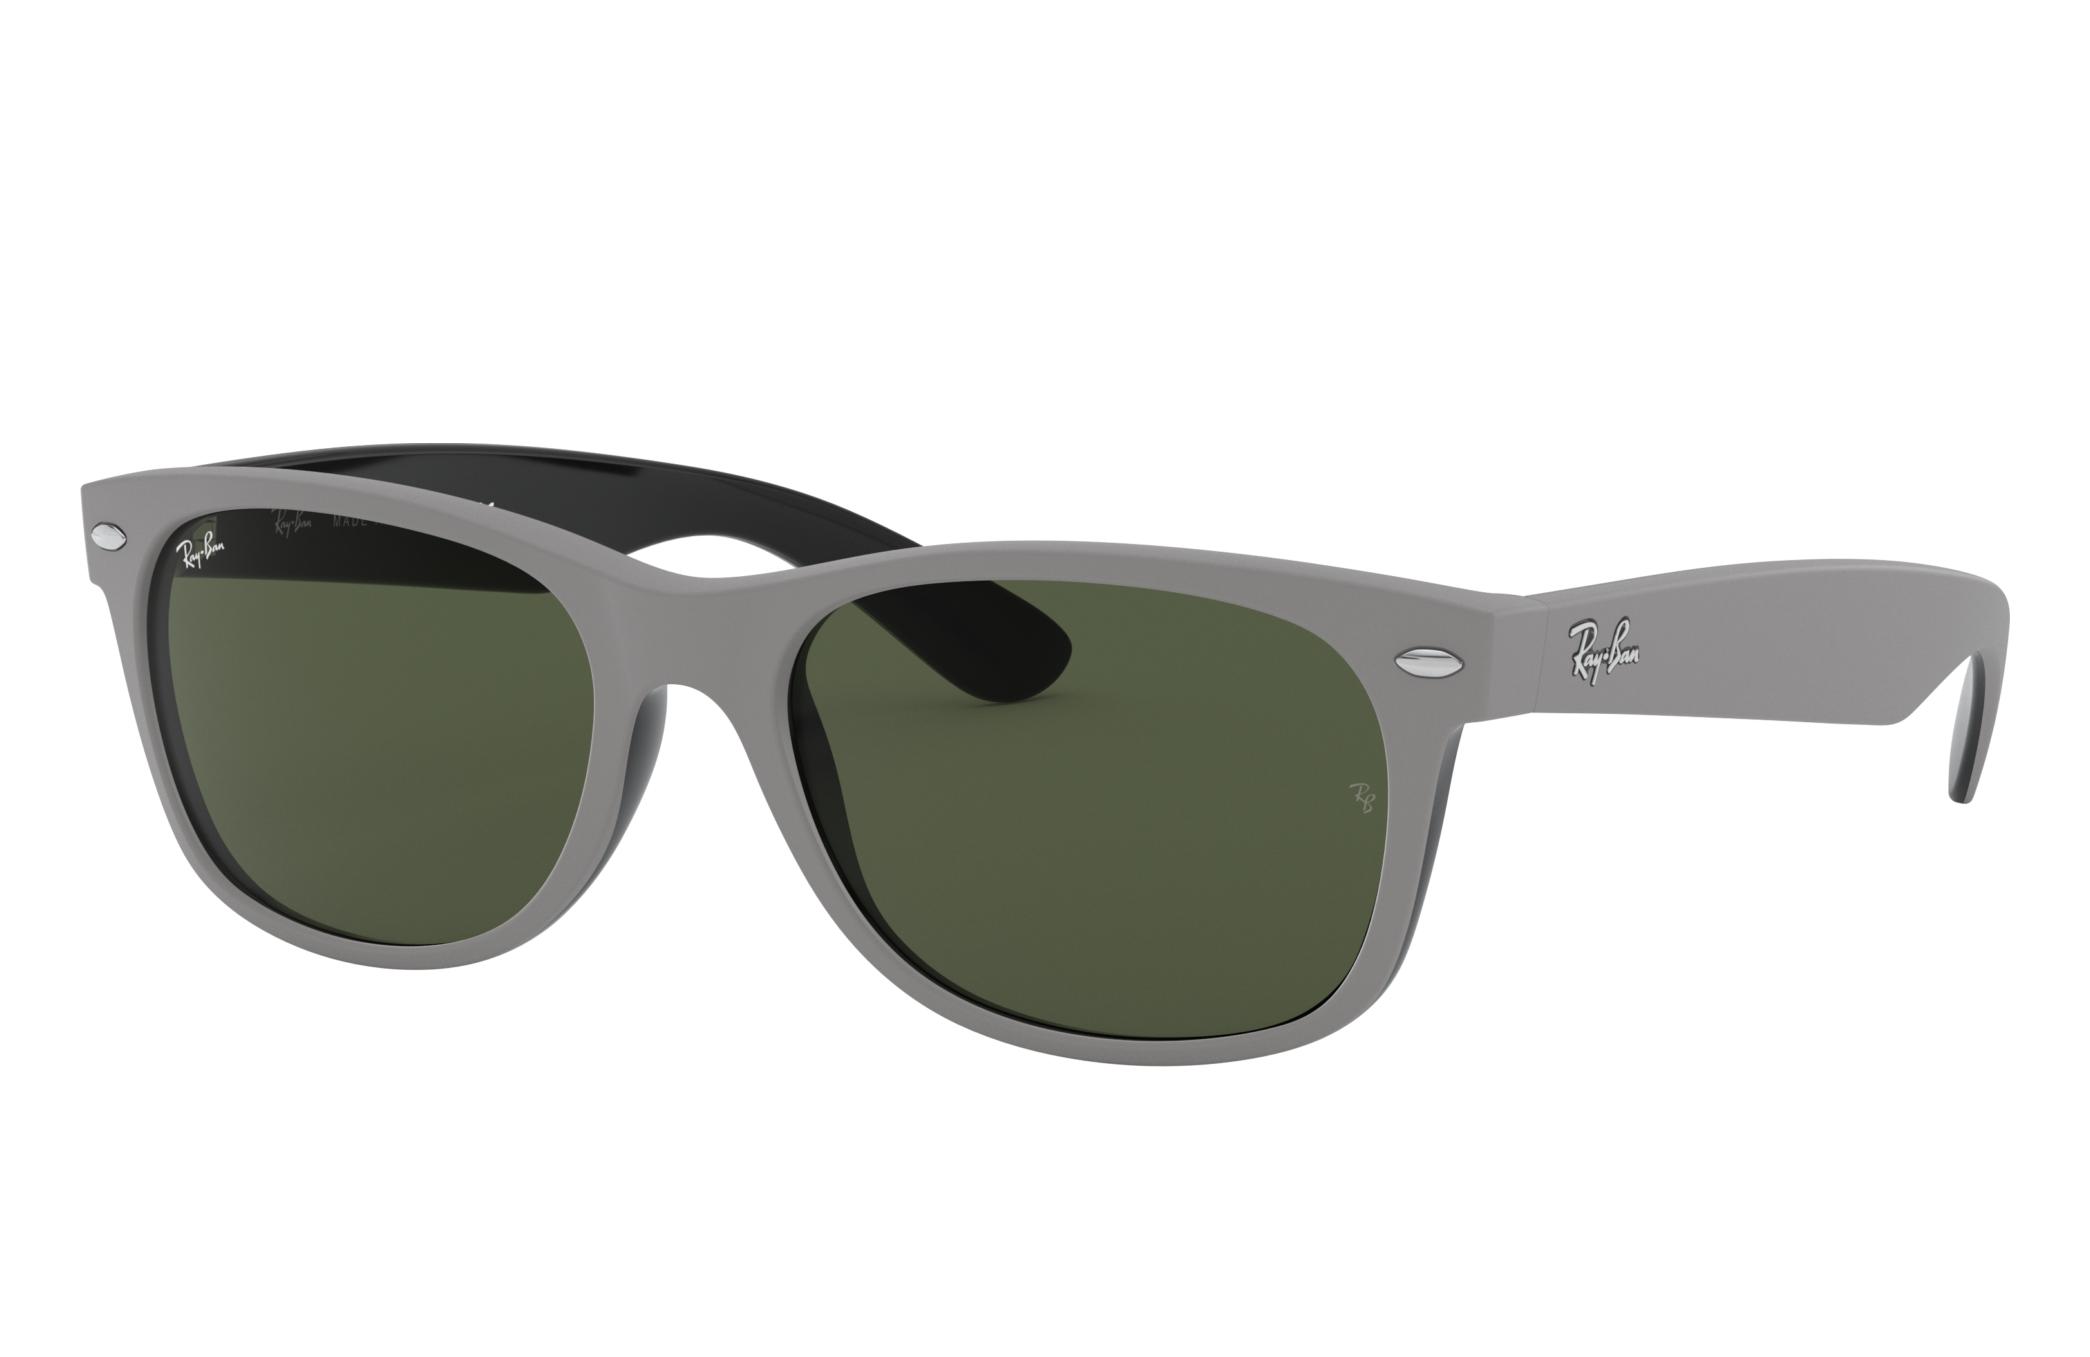 Ray-Ban New Wayfarer Color Mix Grey, Green Lenses - RB2132